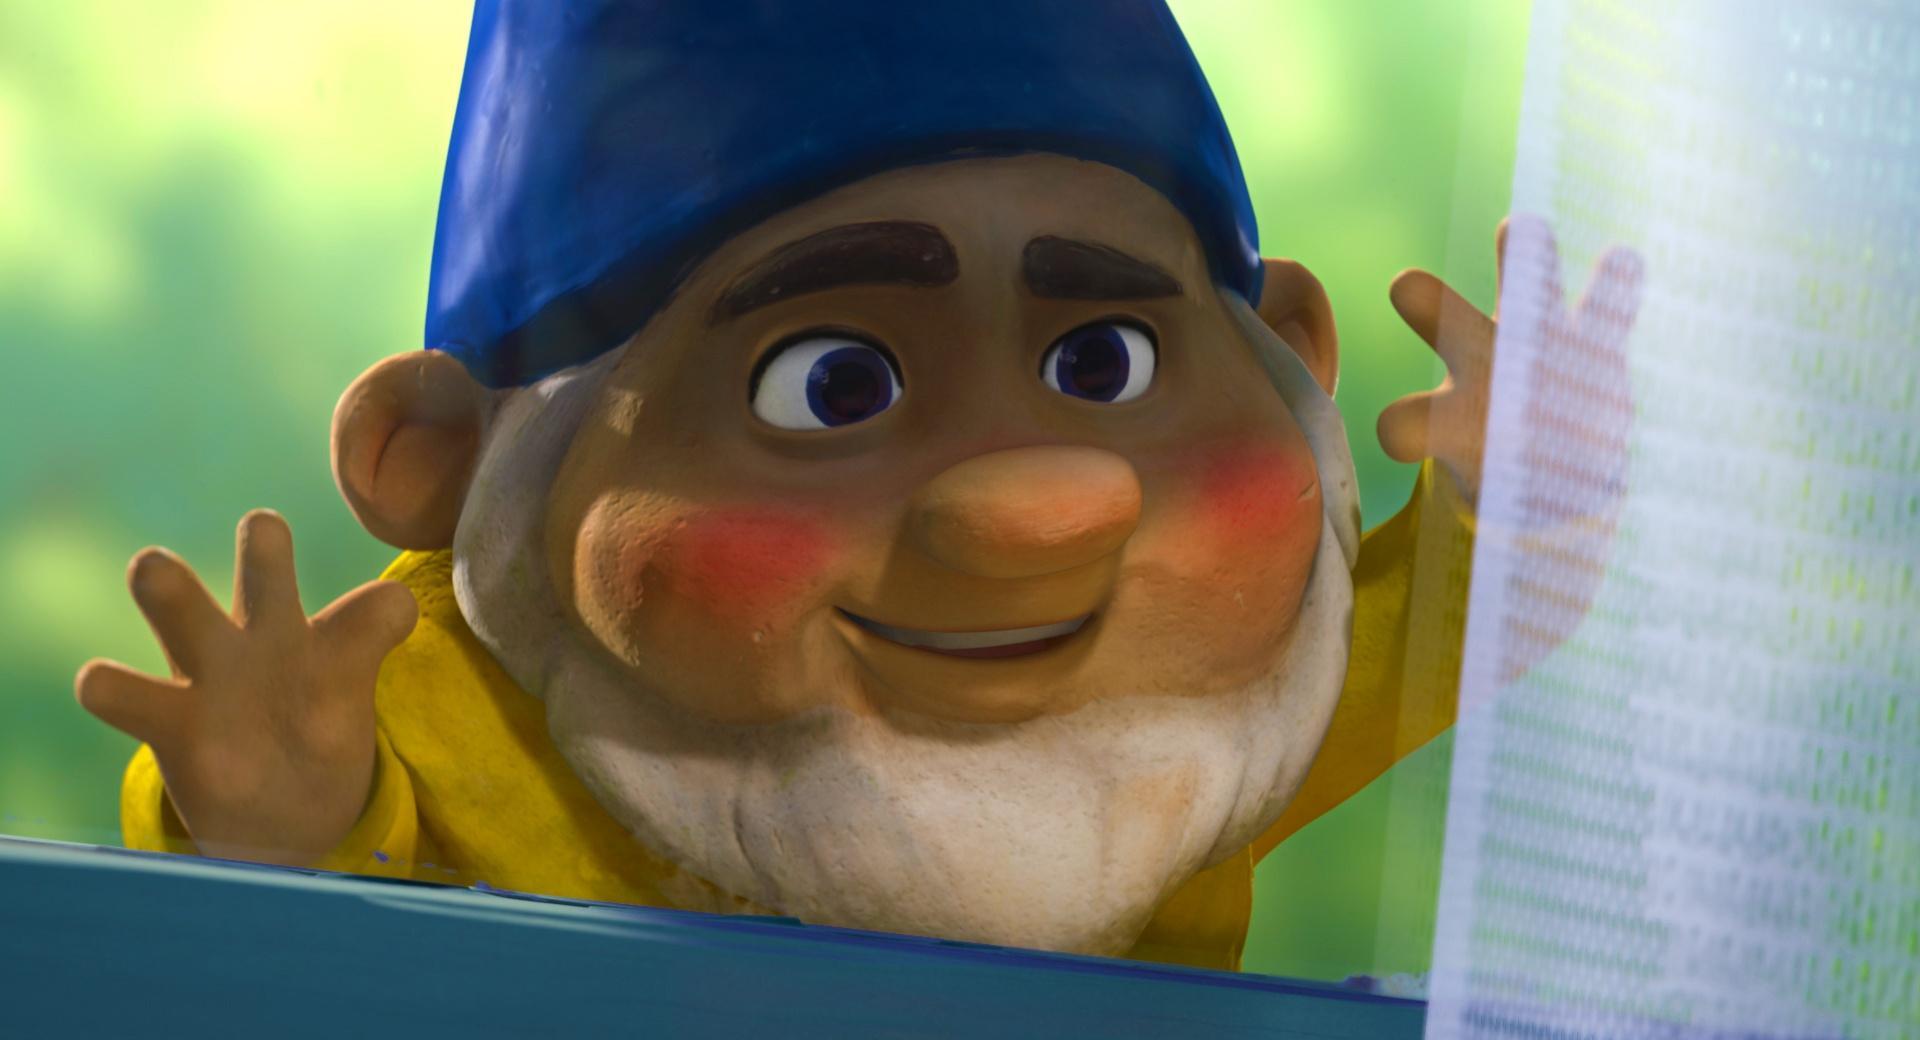 Gnomeo and Juliet, Matt Lucas As Benny wallpapers HD quality